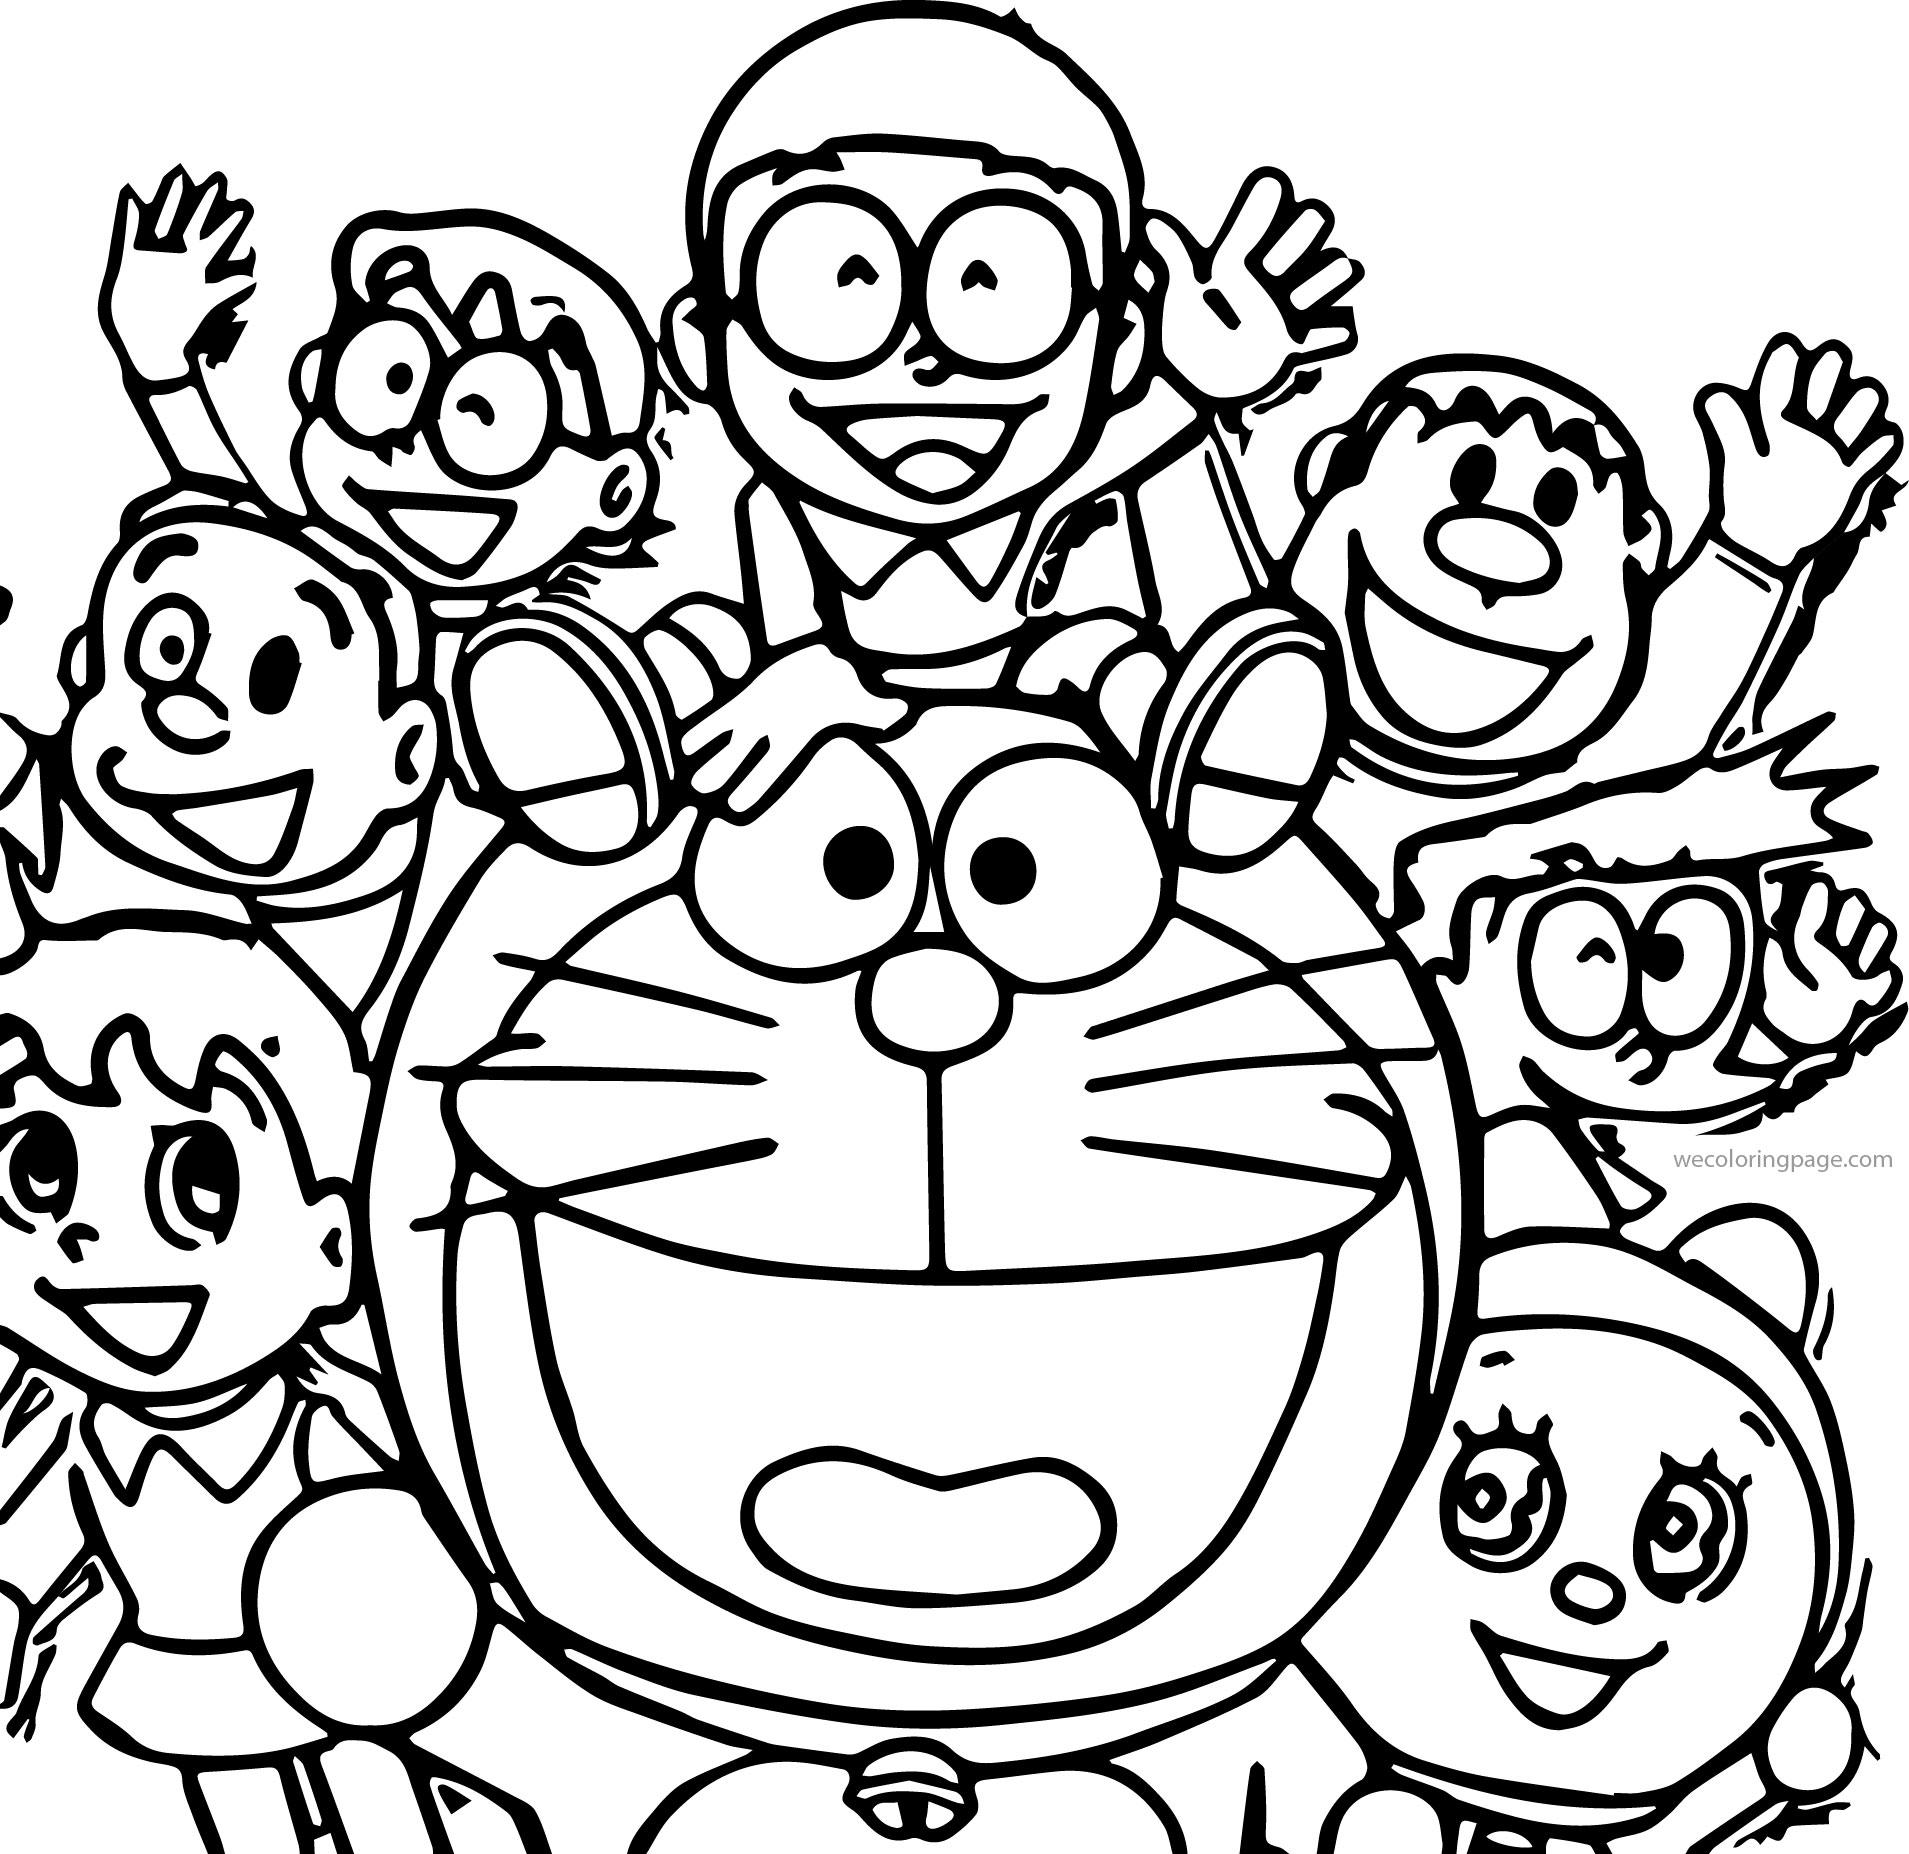 Doraemon wallpaper coloring page